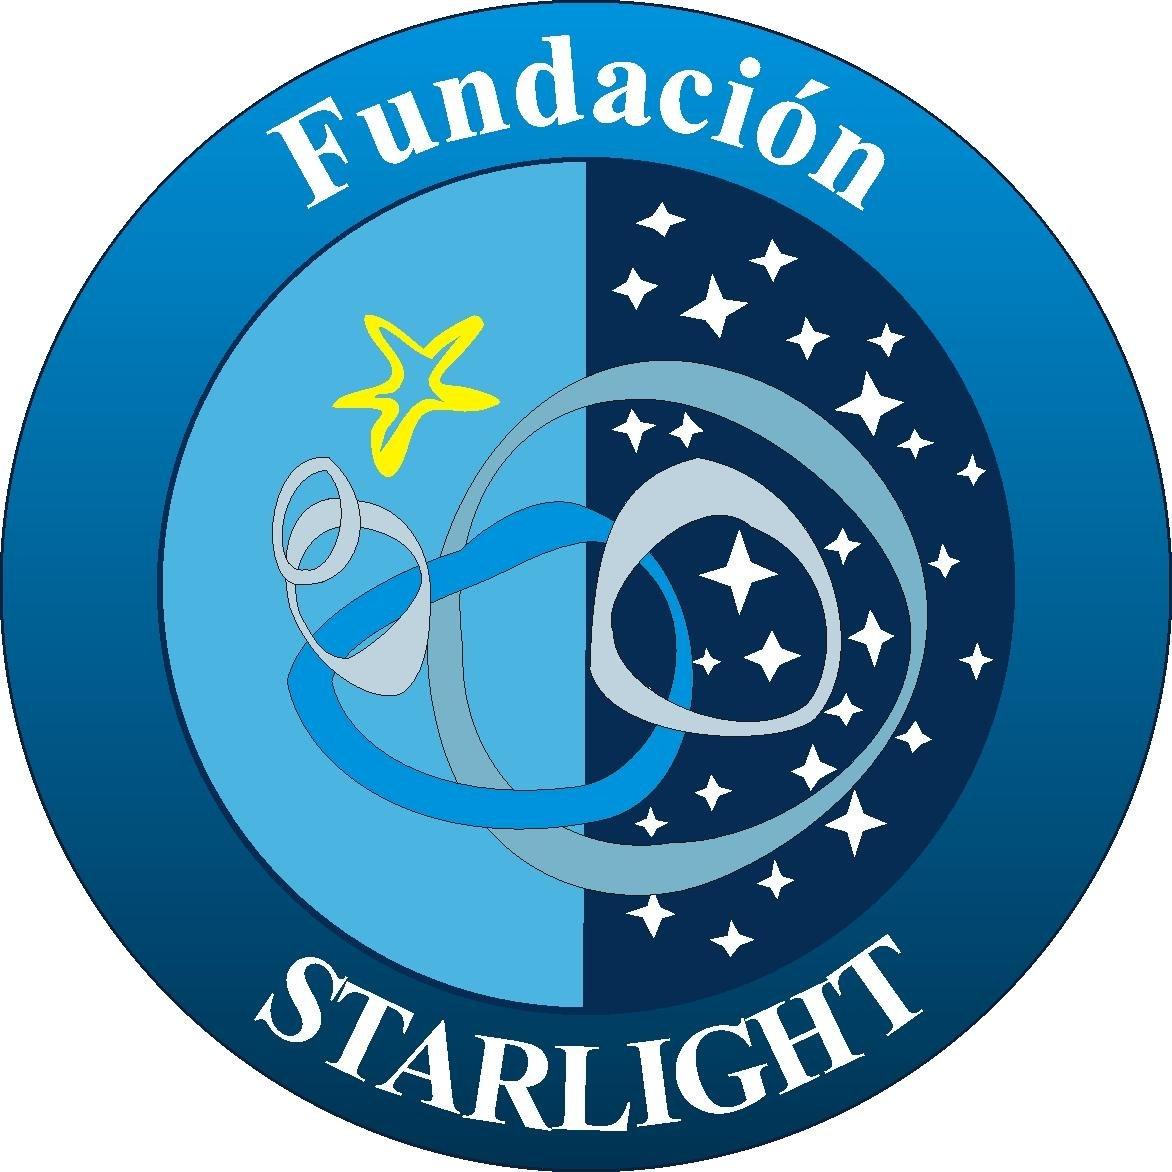 fundación starlight on twitter astroturismo en la rioja valles